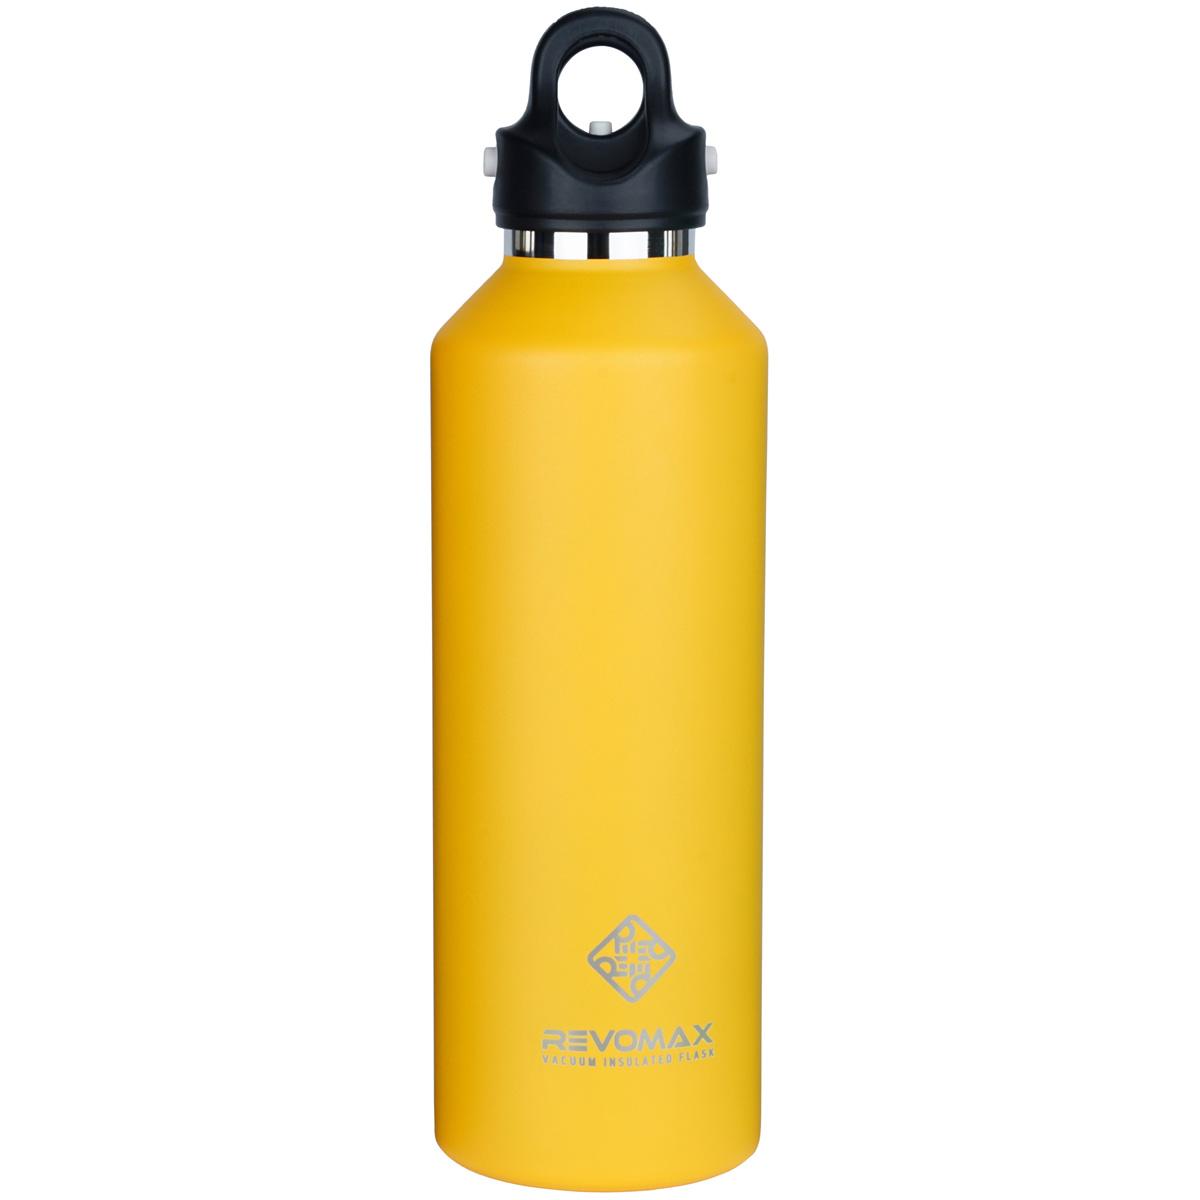 REVOMAX2 950ml 真空断熱ボトル